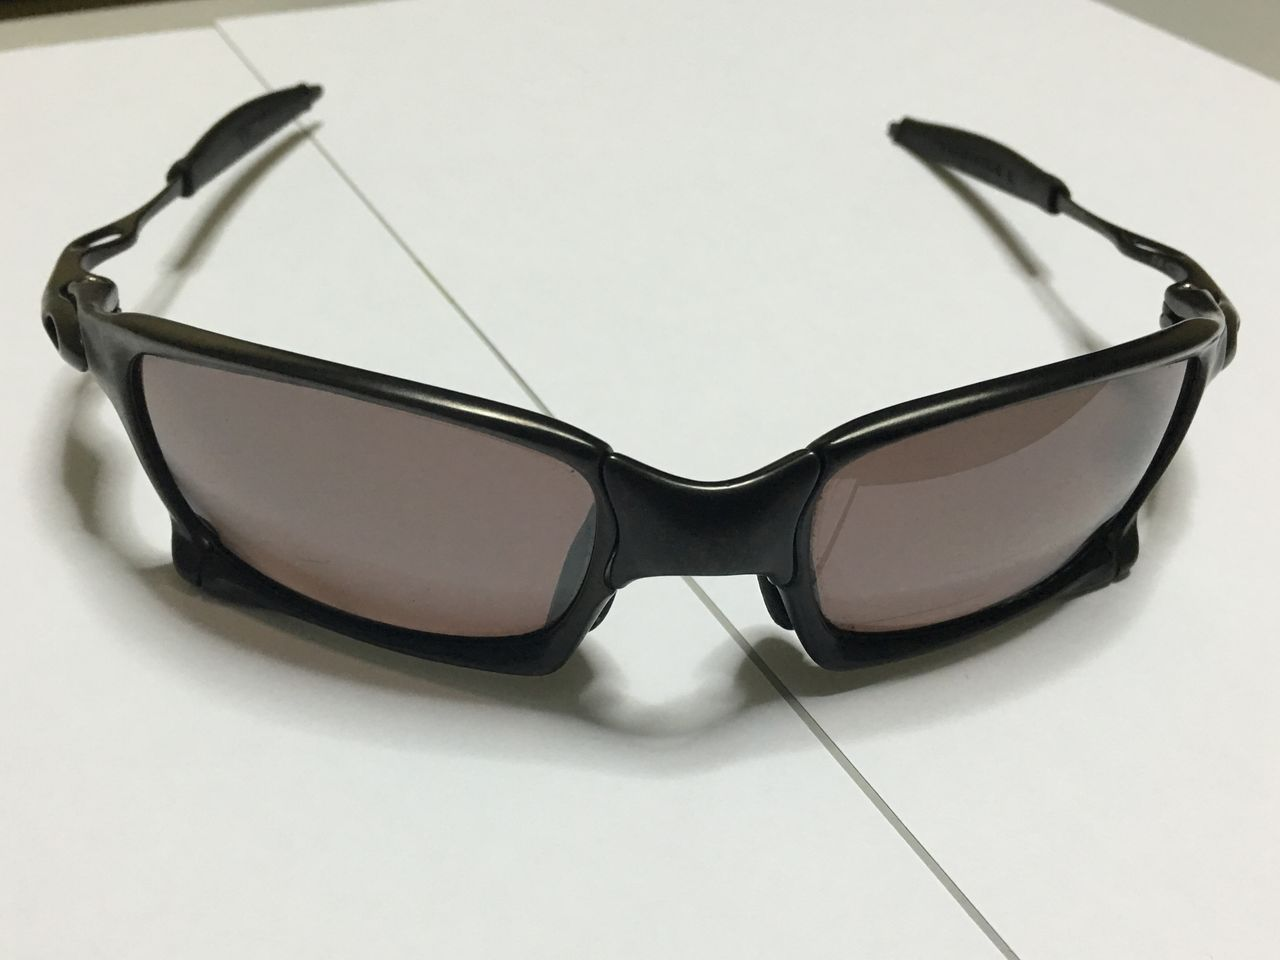 FS: Xsquared, Carbon frame OOBIP sku oo6011-08, Badman Plasma frame with Sapphire lenses - IMG_1383.jpg